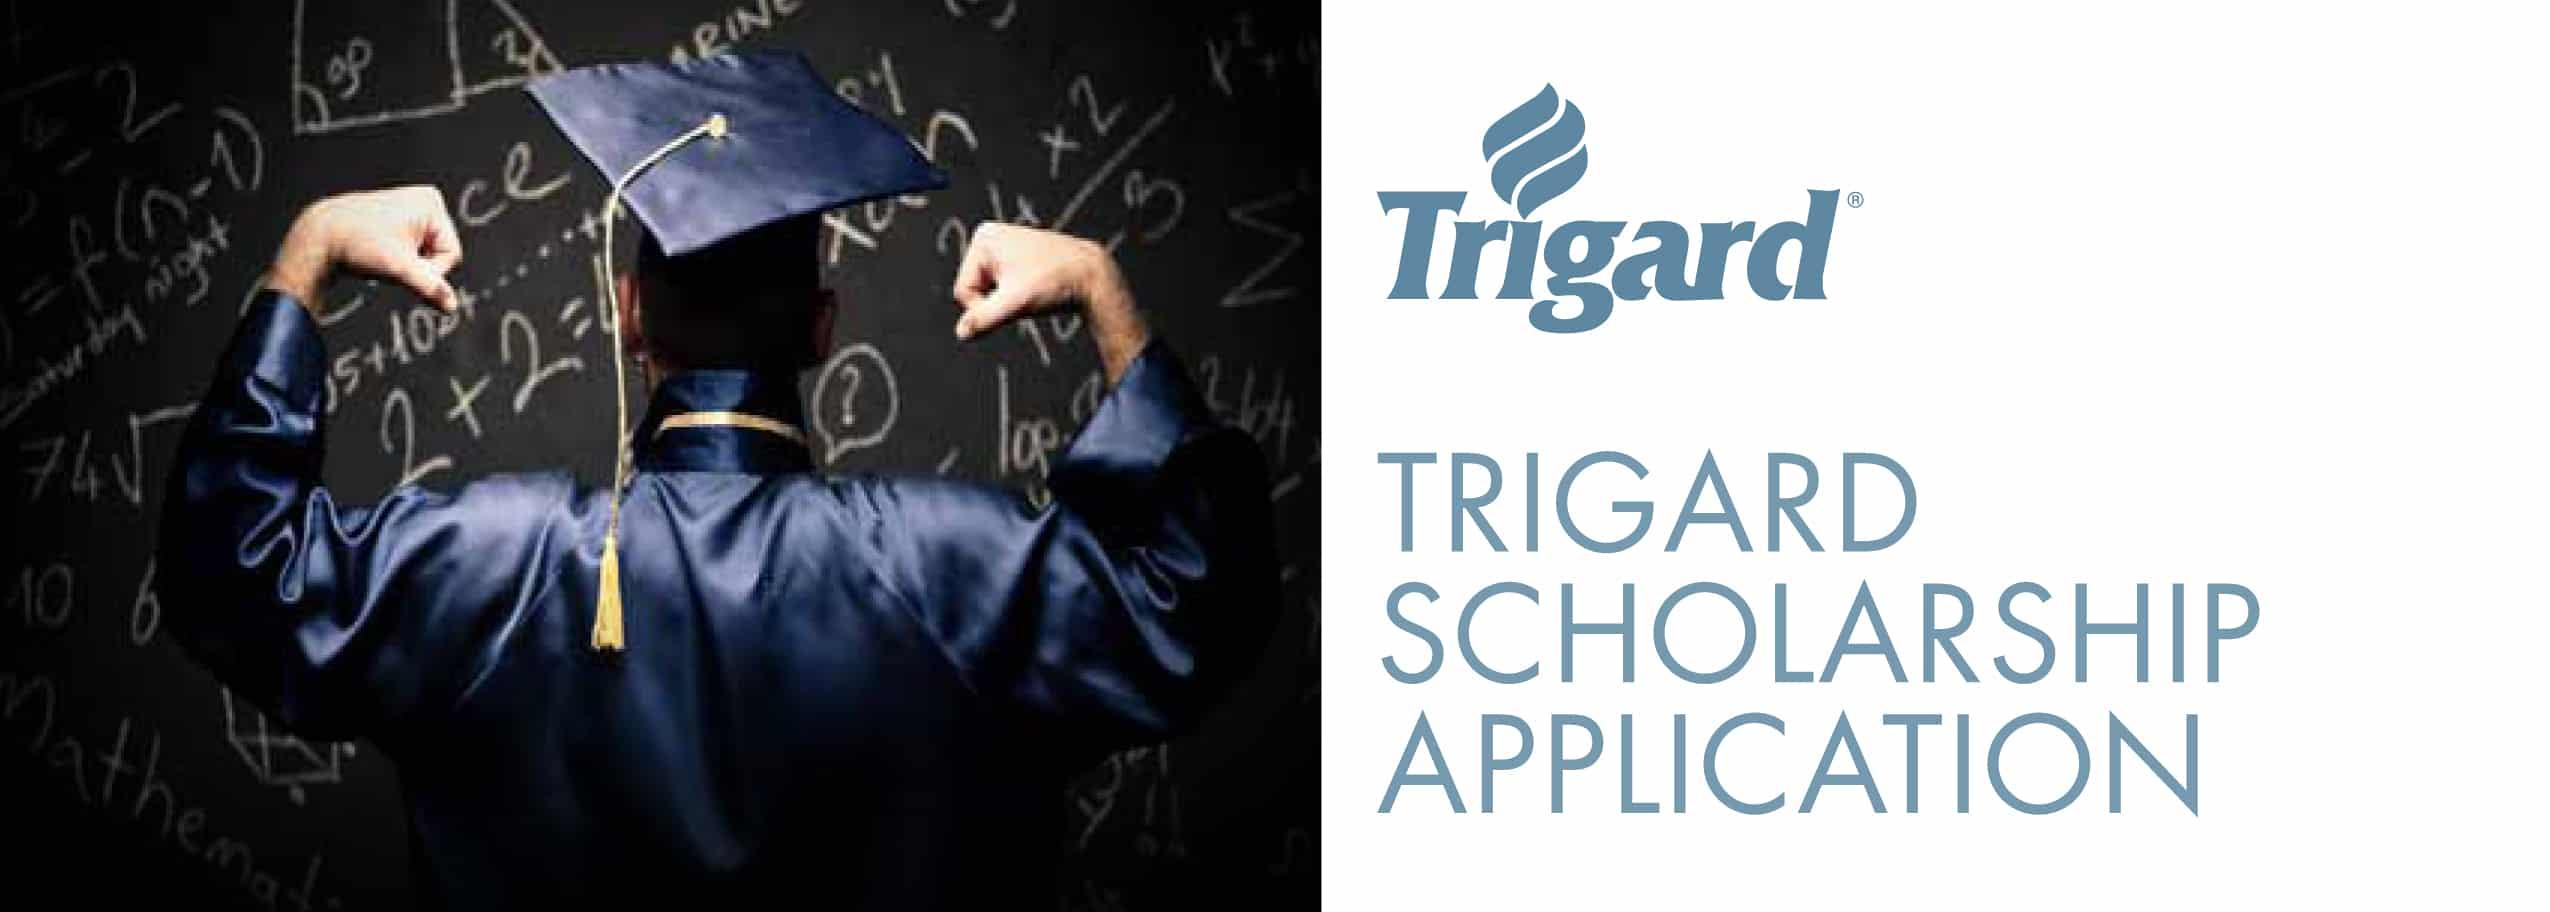 Trigard Scholarship Application